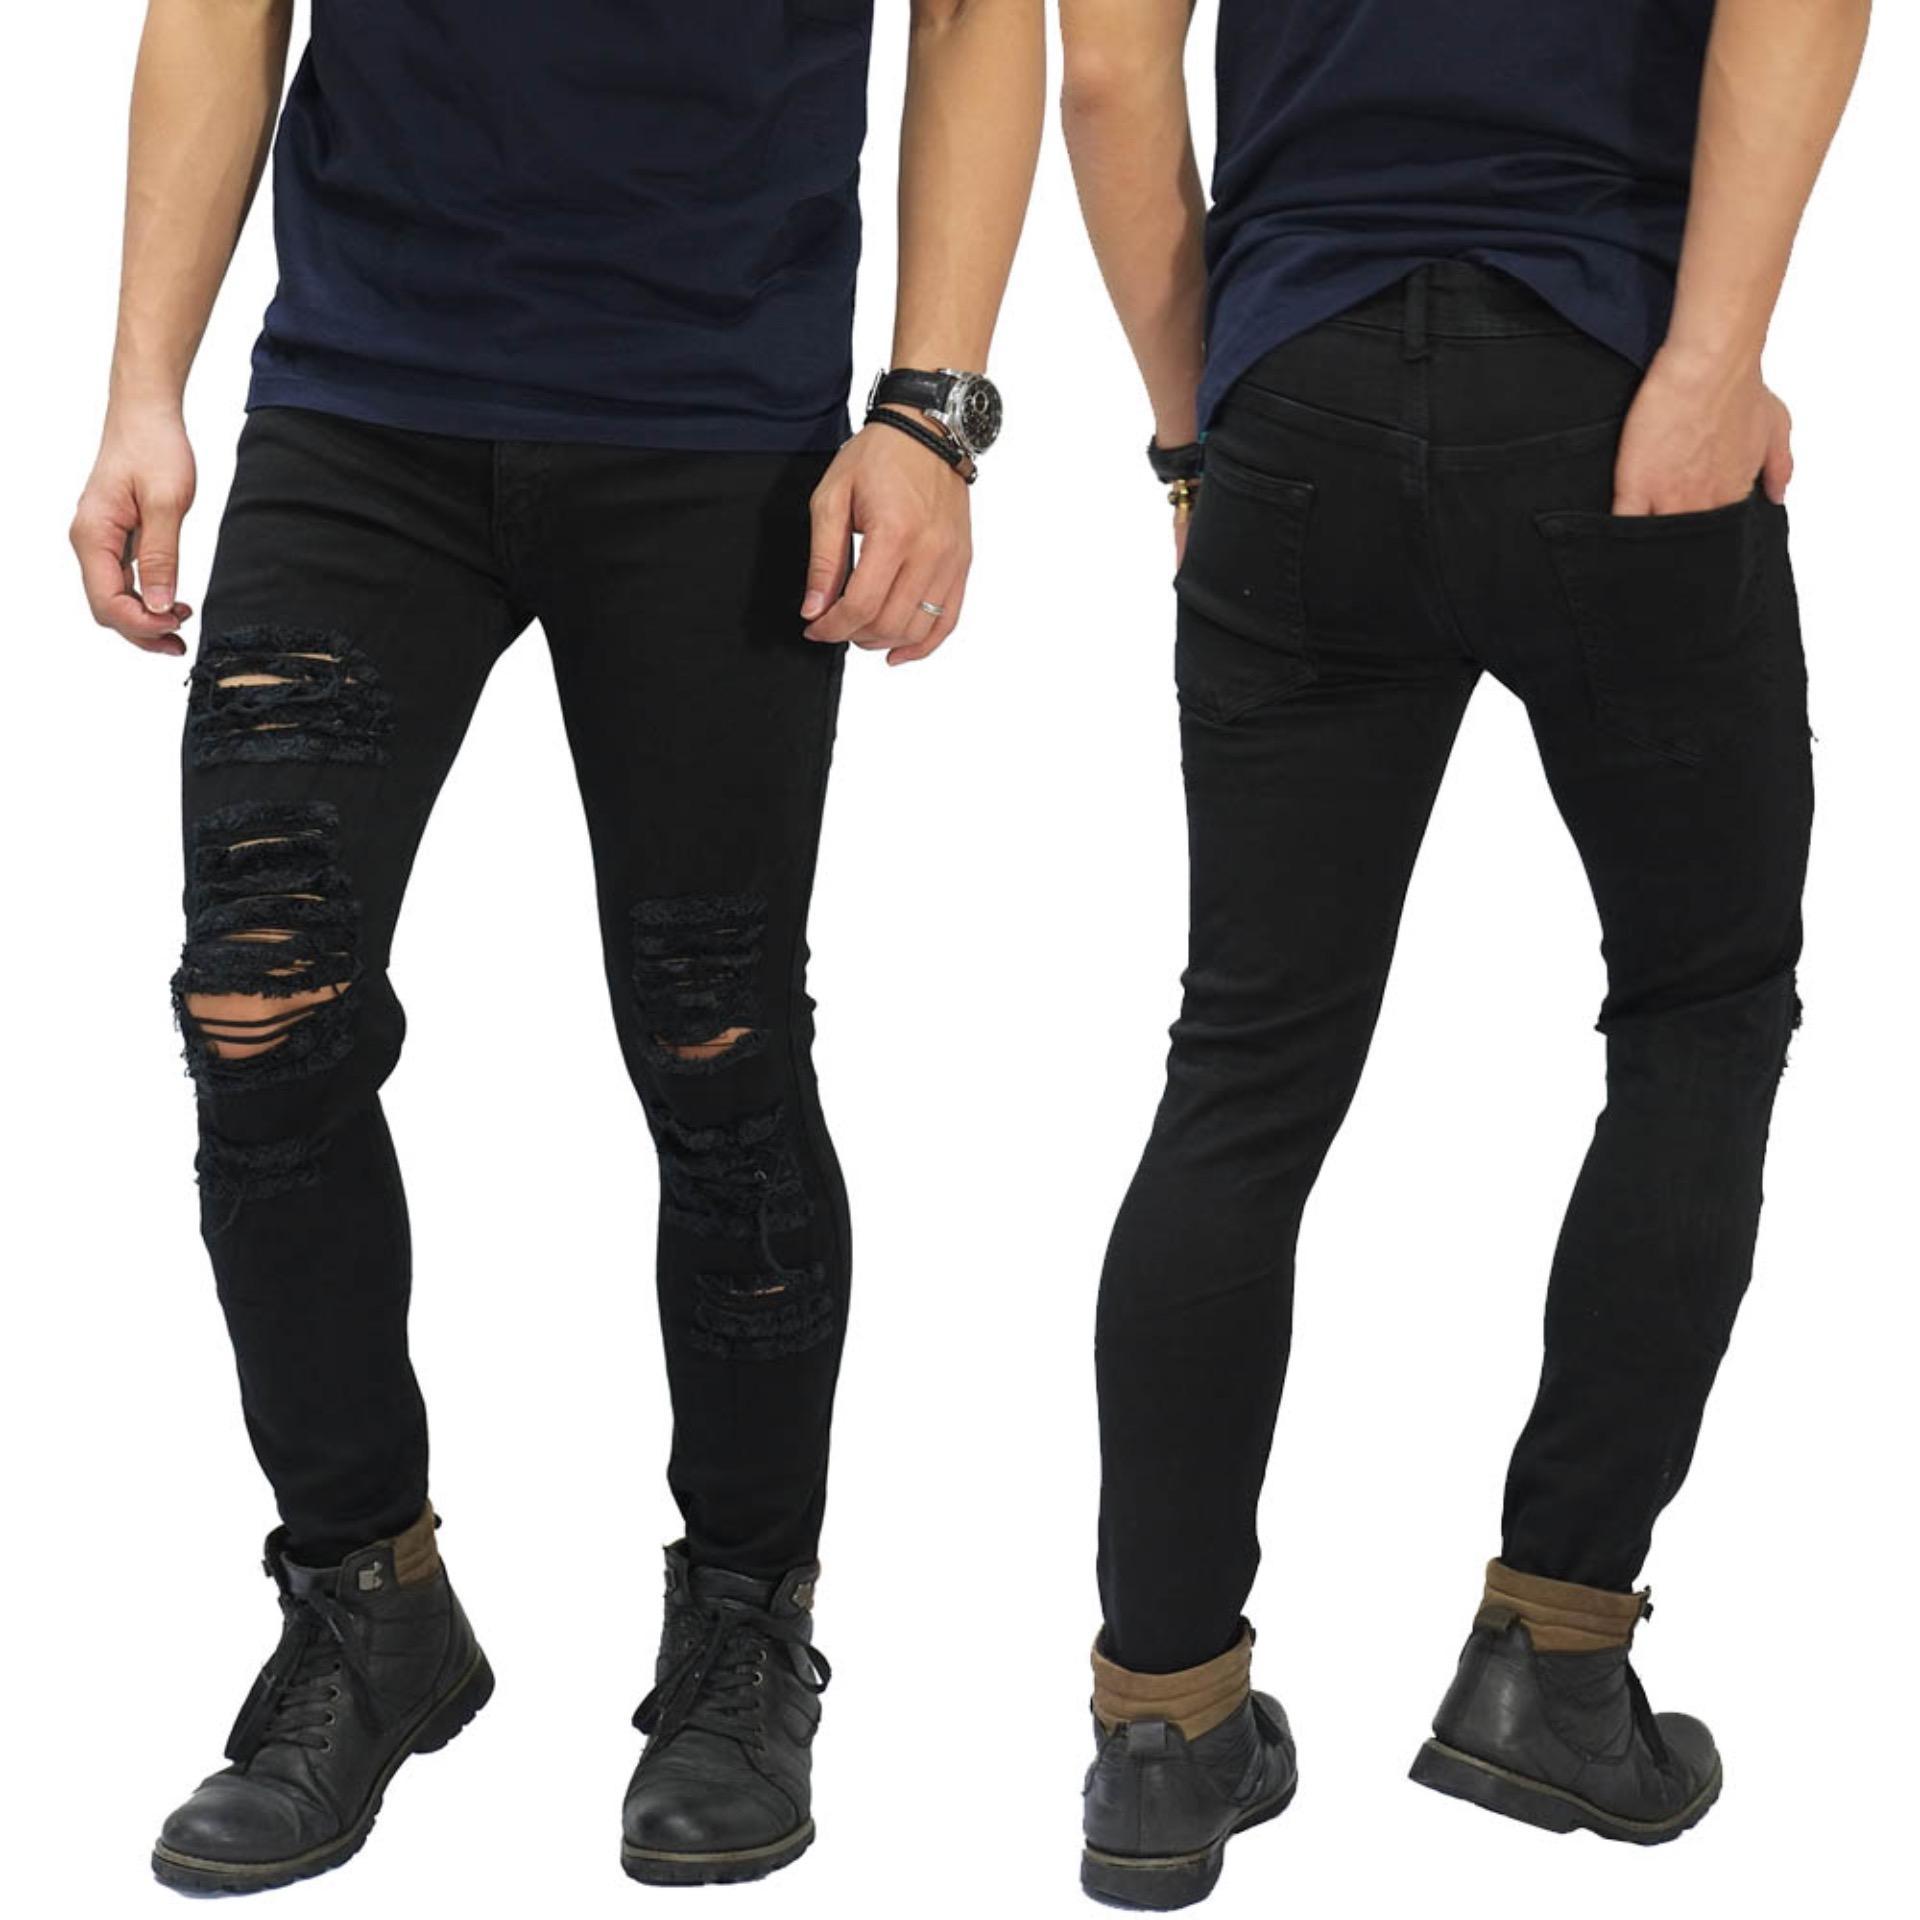 Jual Frozenshop Jeans Skinny Ripped Damage Black Di Indonesia